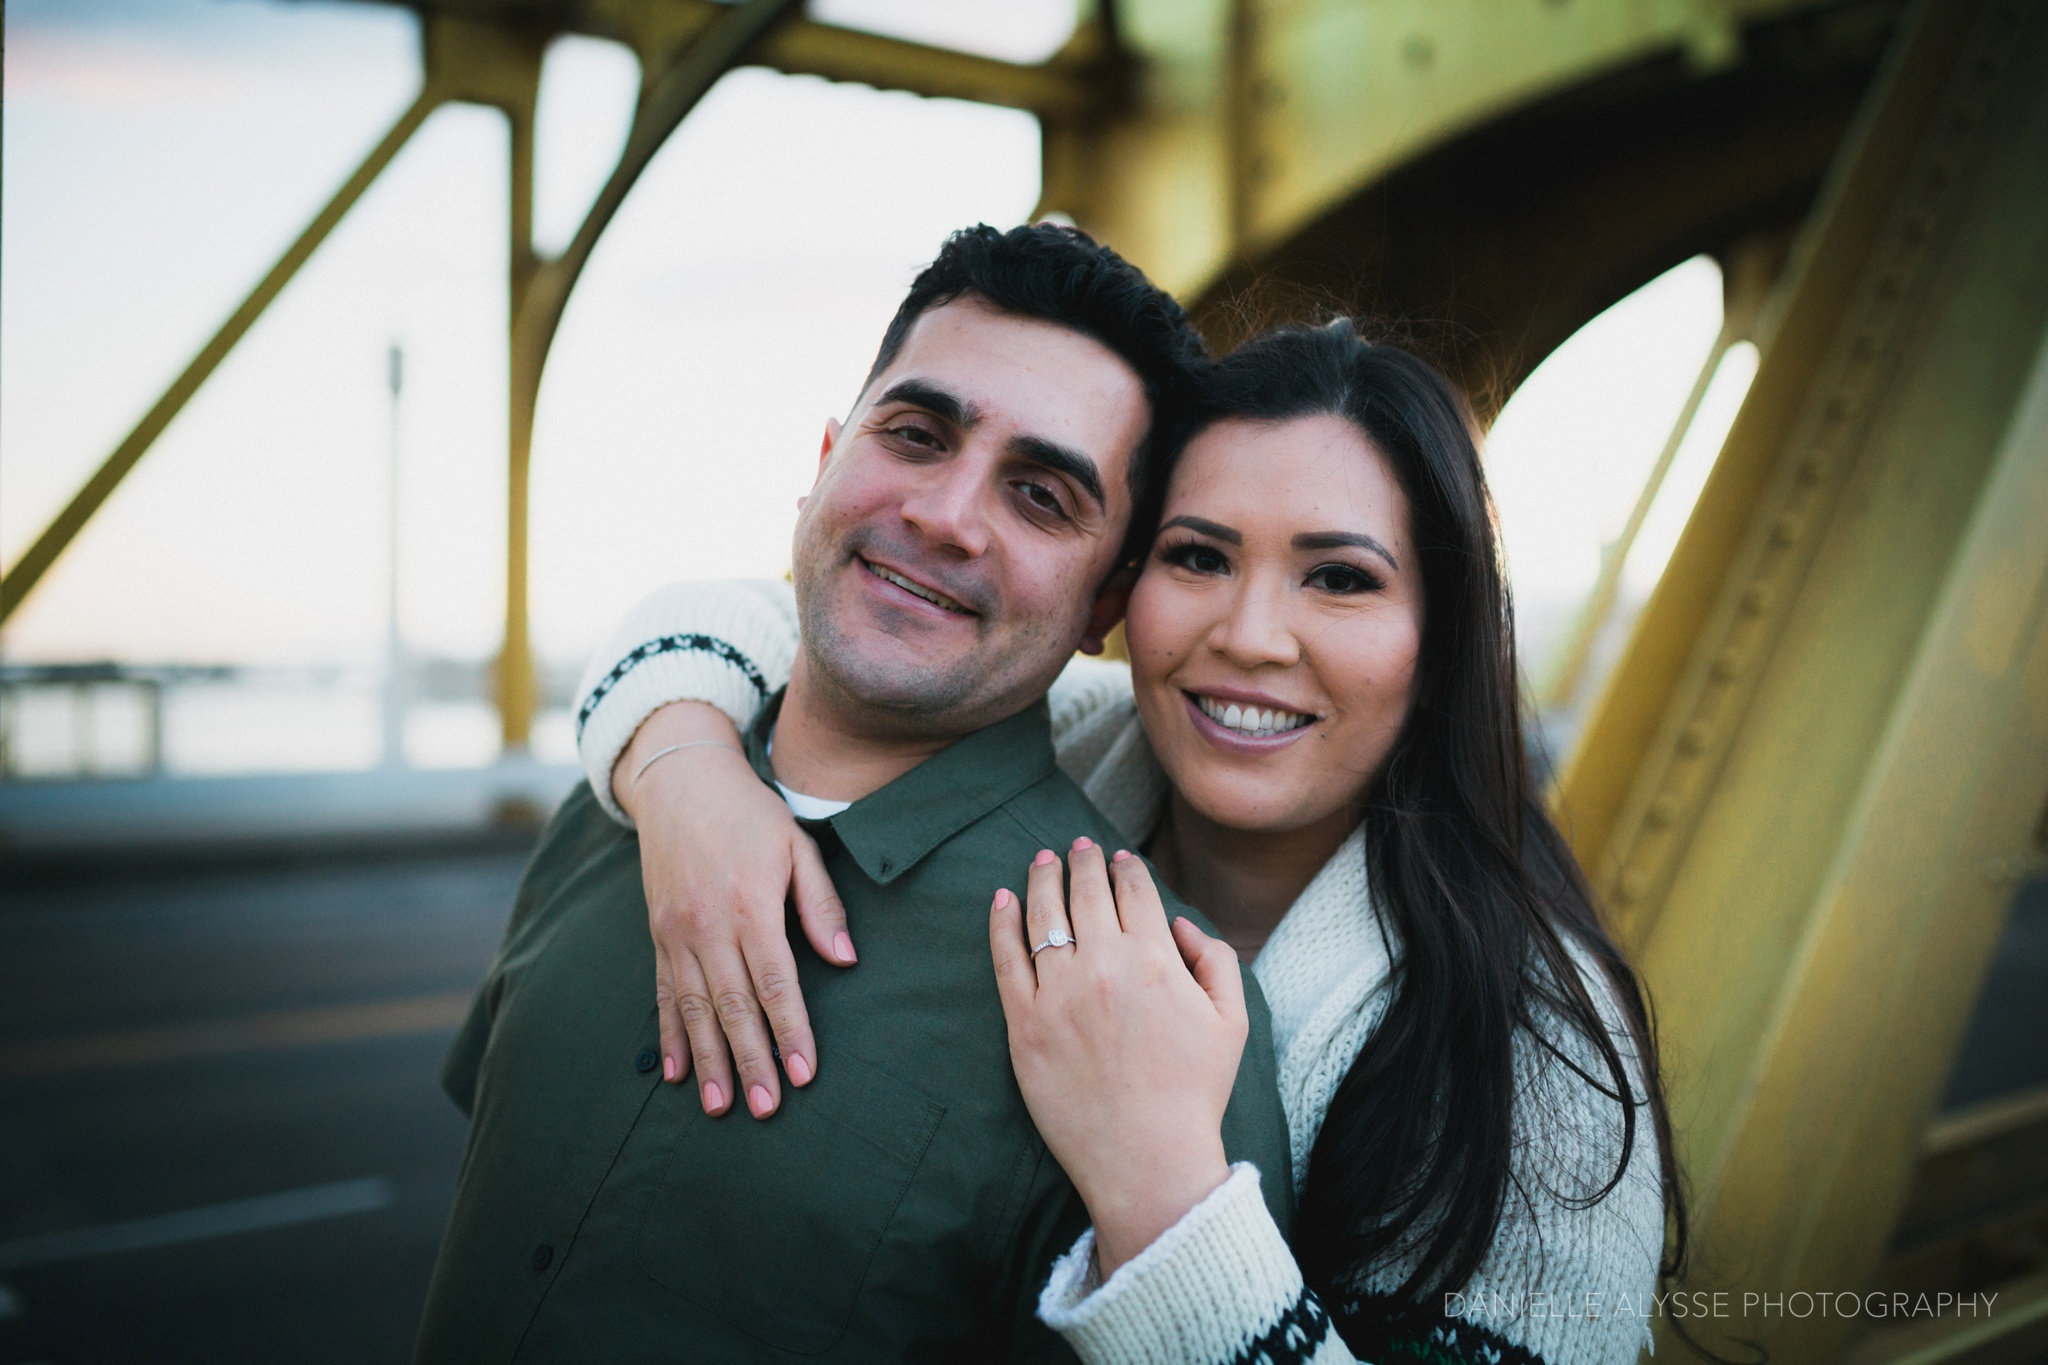 180324_engagement_lily_danielle_alysse_photography_downtown_sacramento_wedding_photographer_blog_82_WEB.jpg